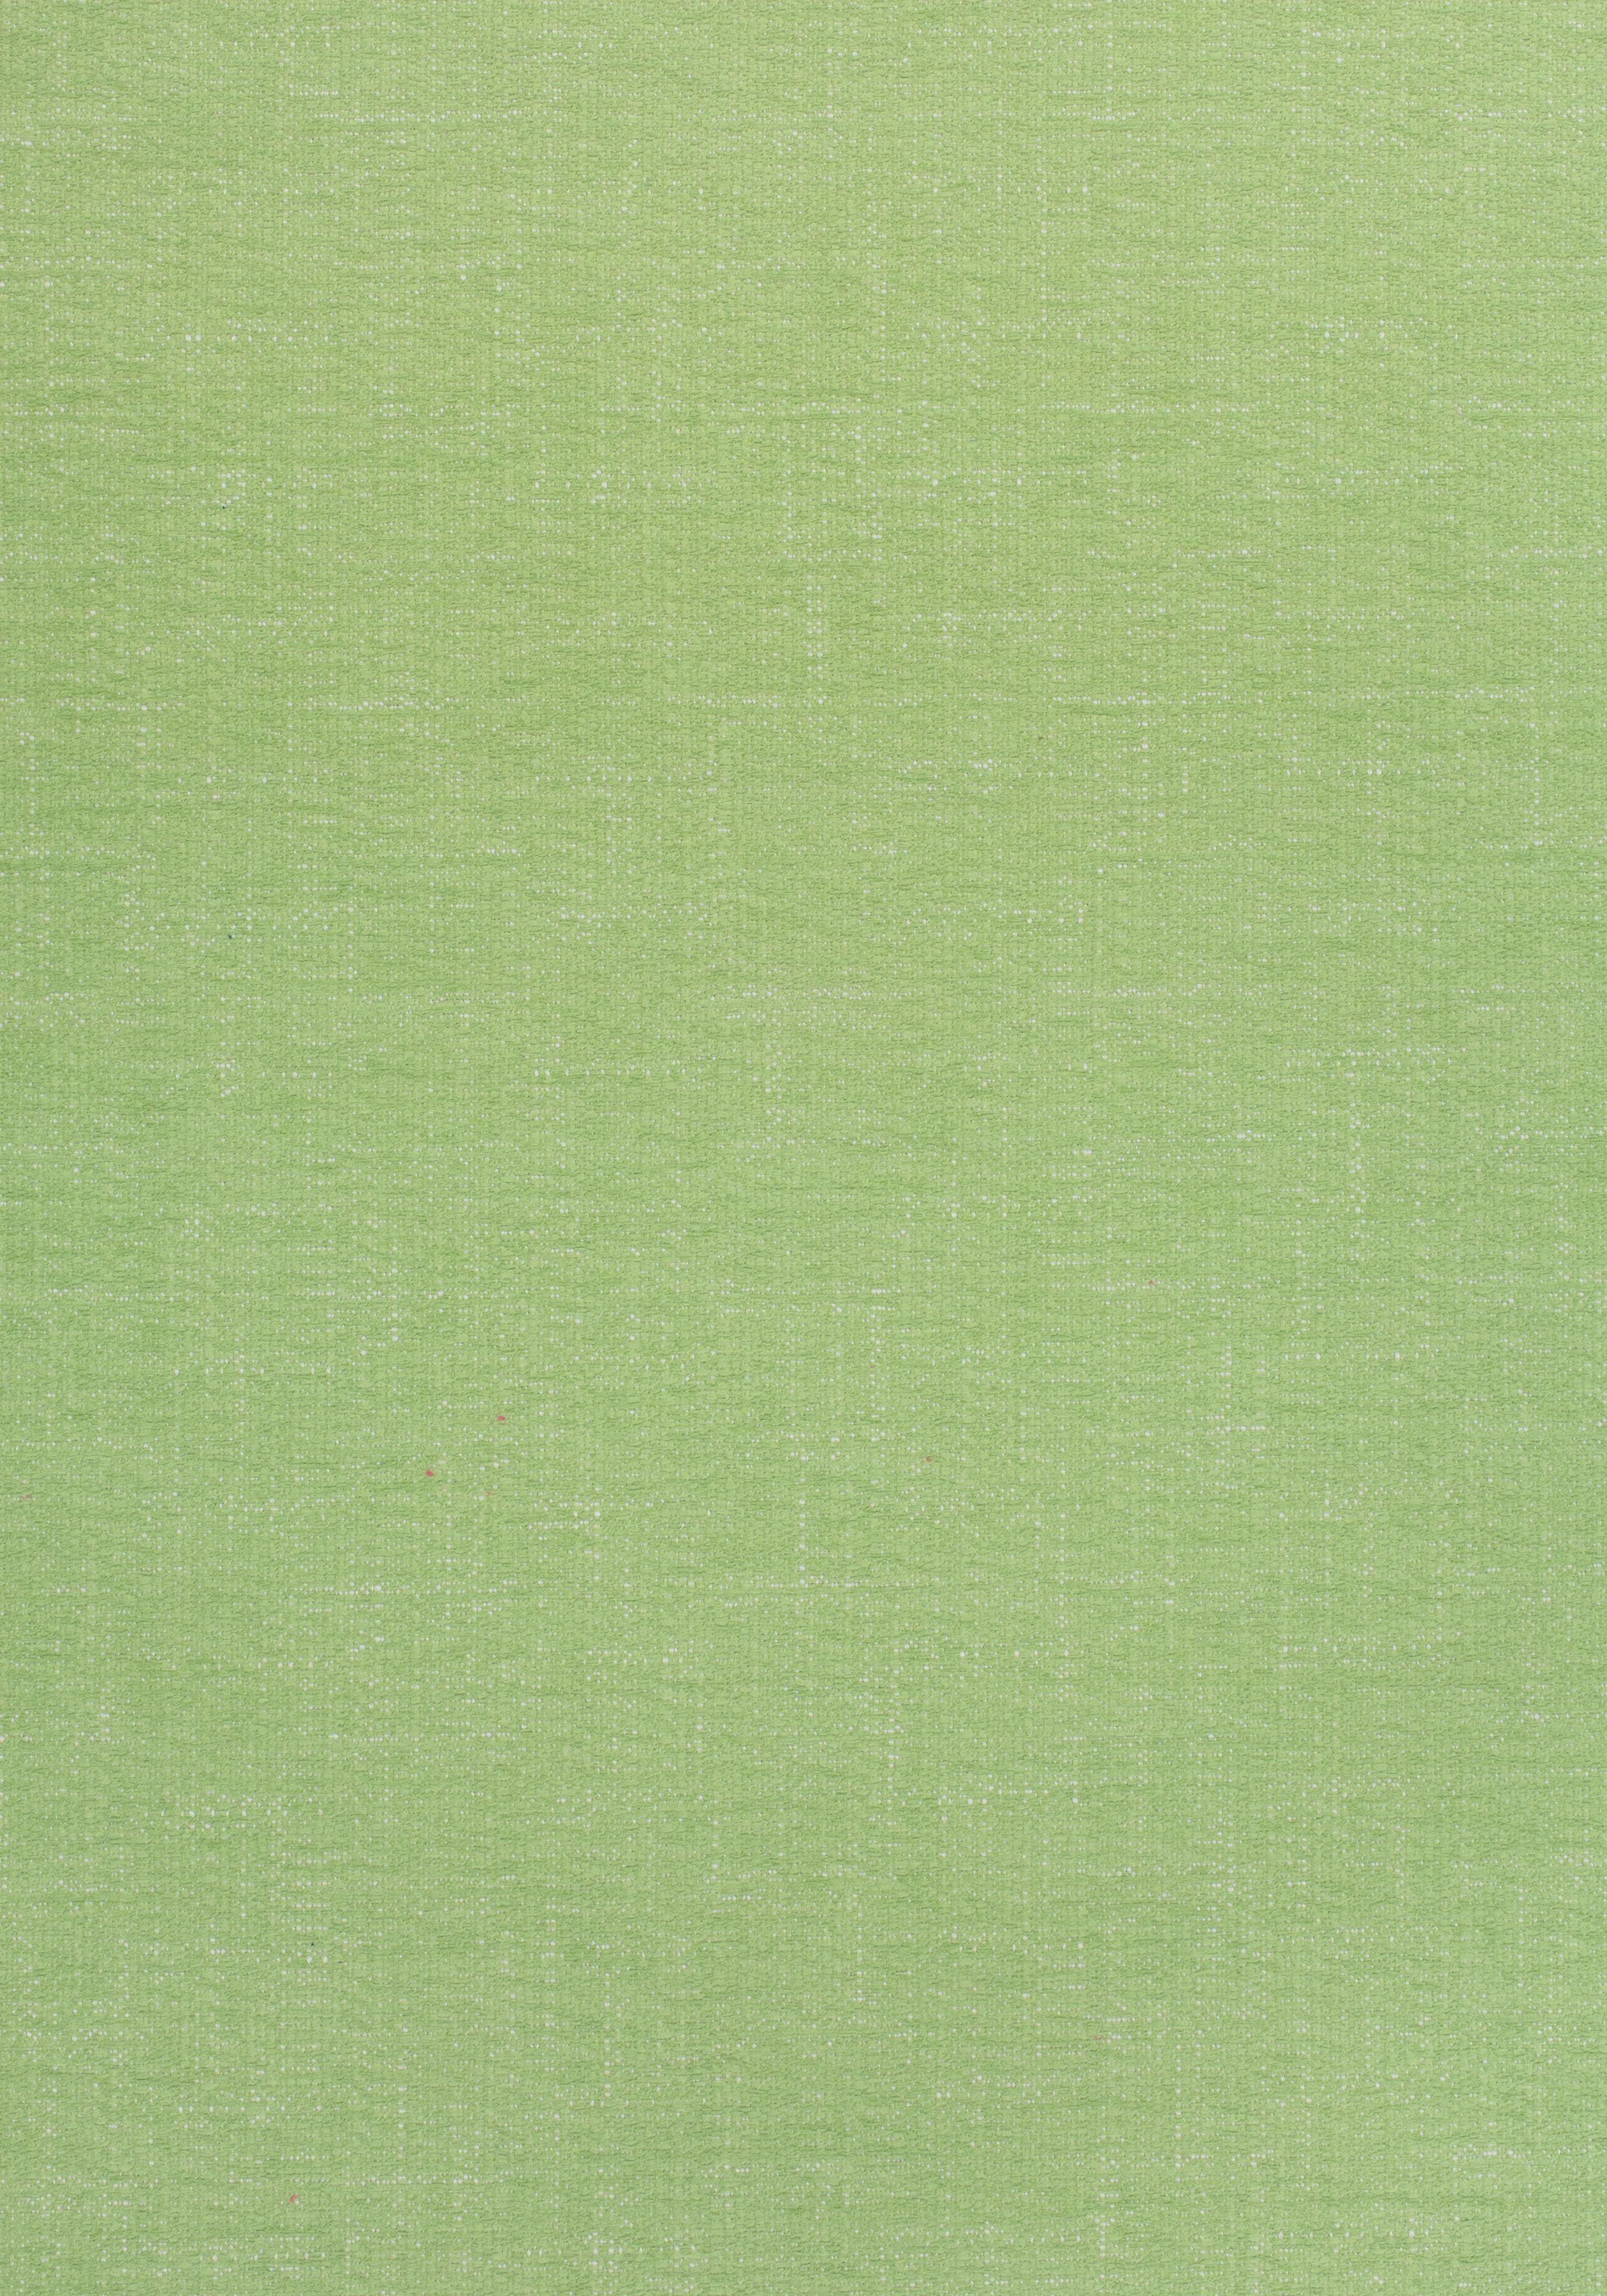 VISTA, Green Apple, W73385, Collection Landmark Textures ...